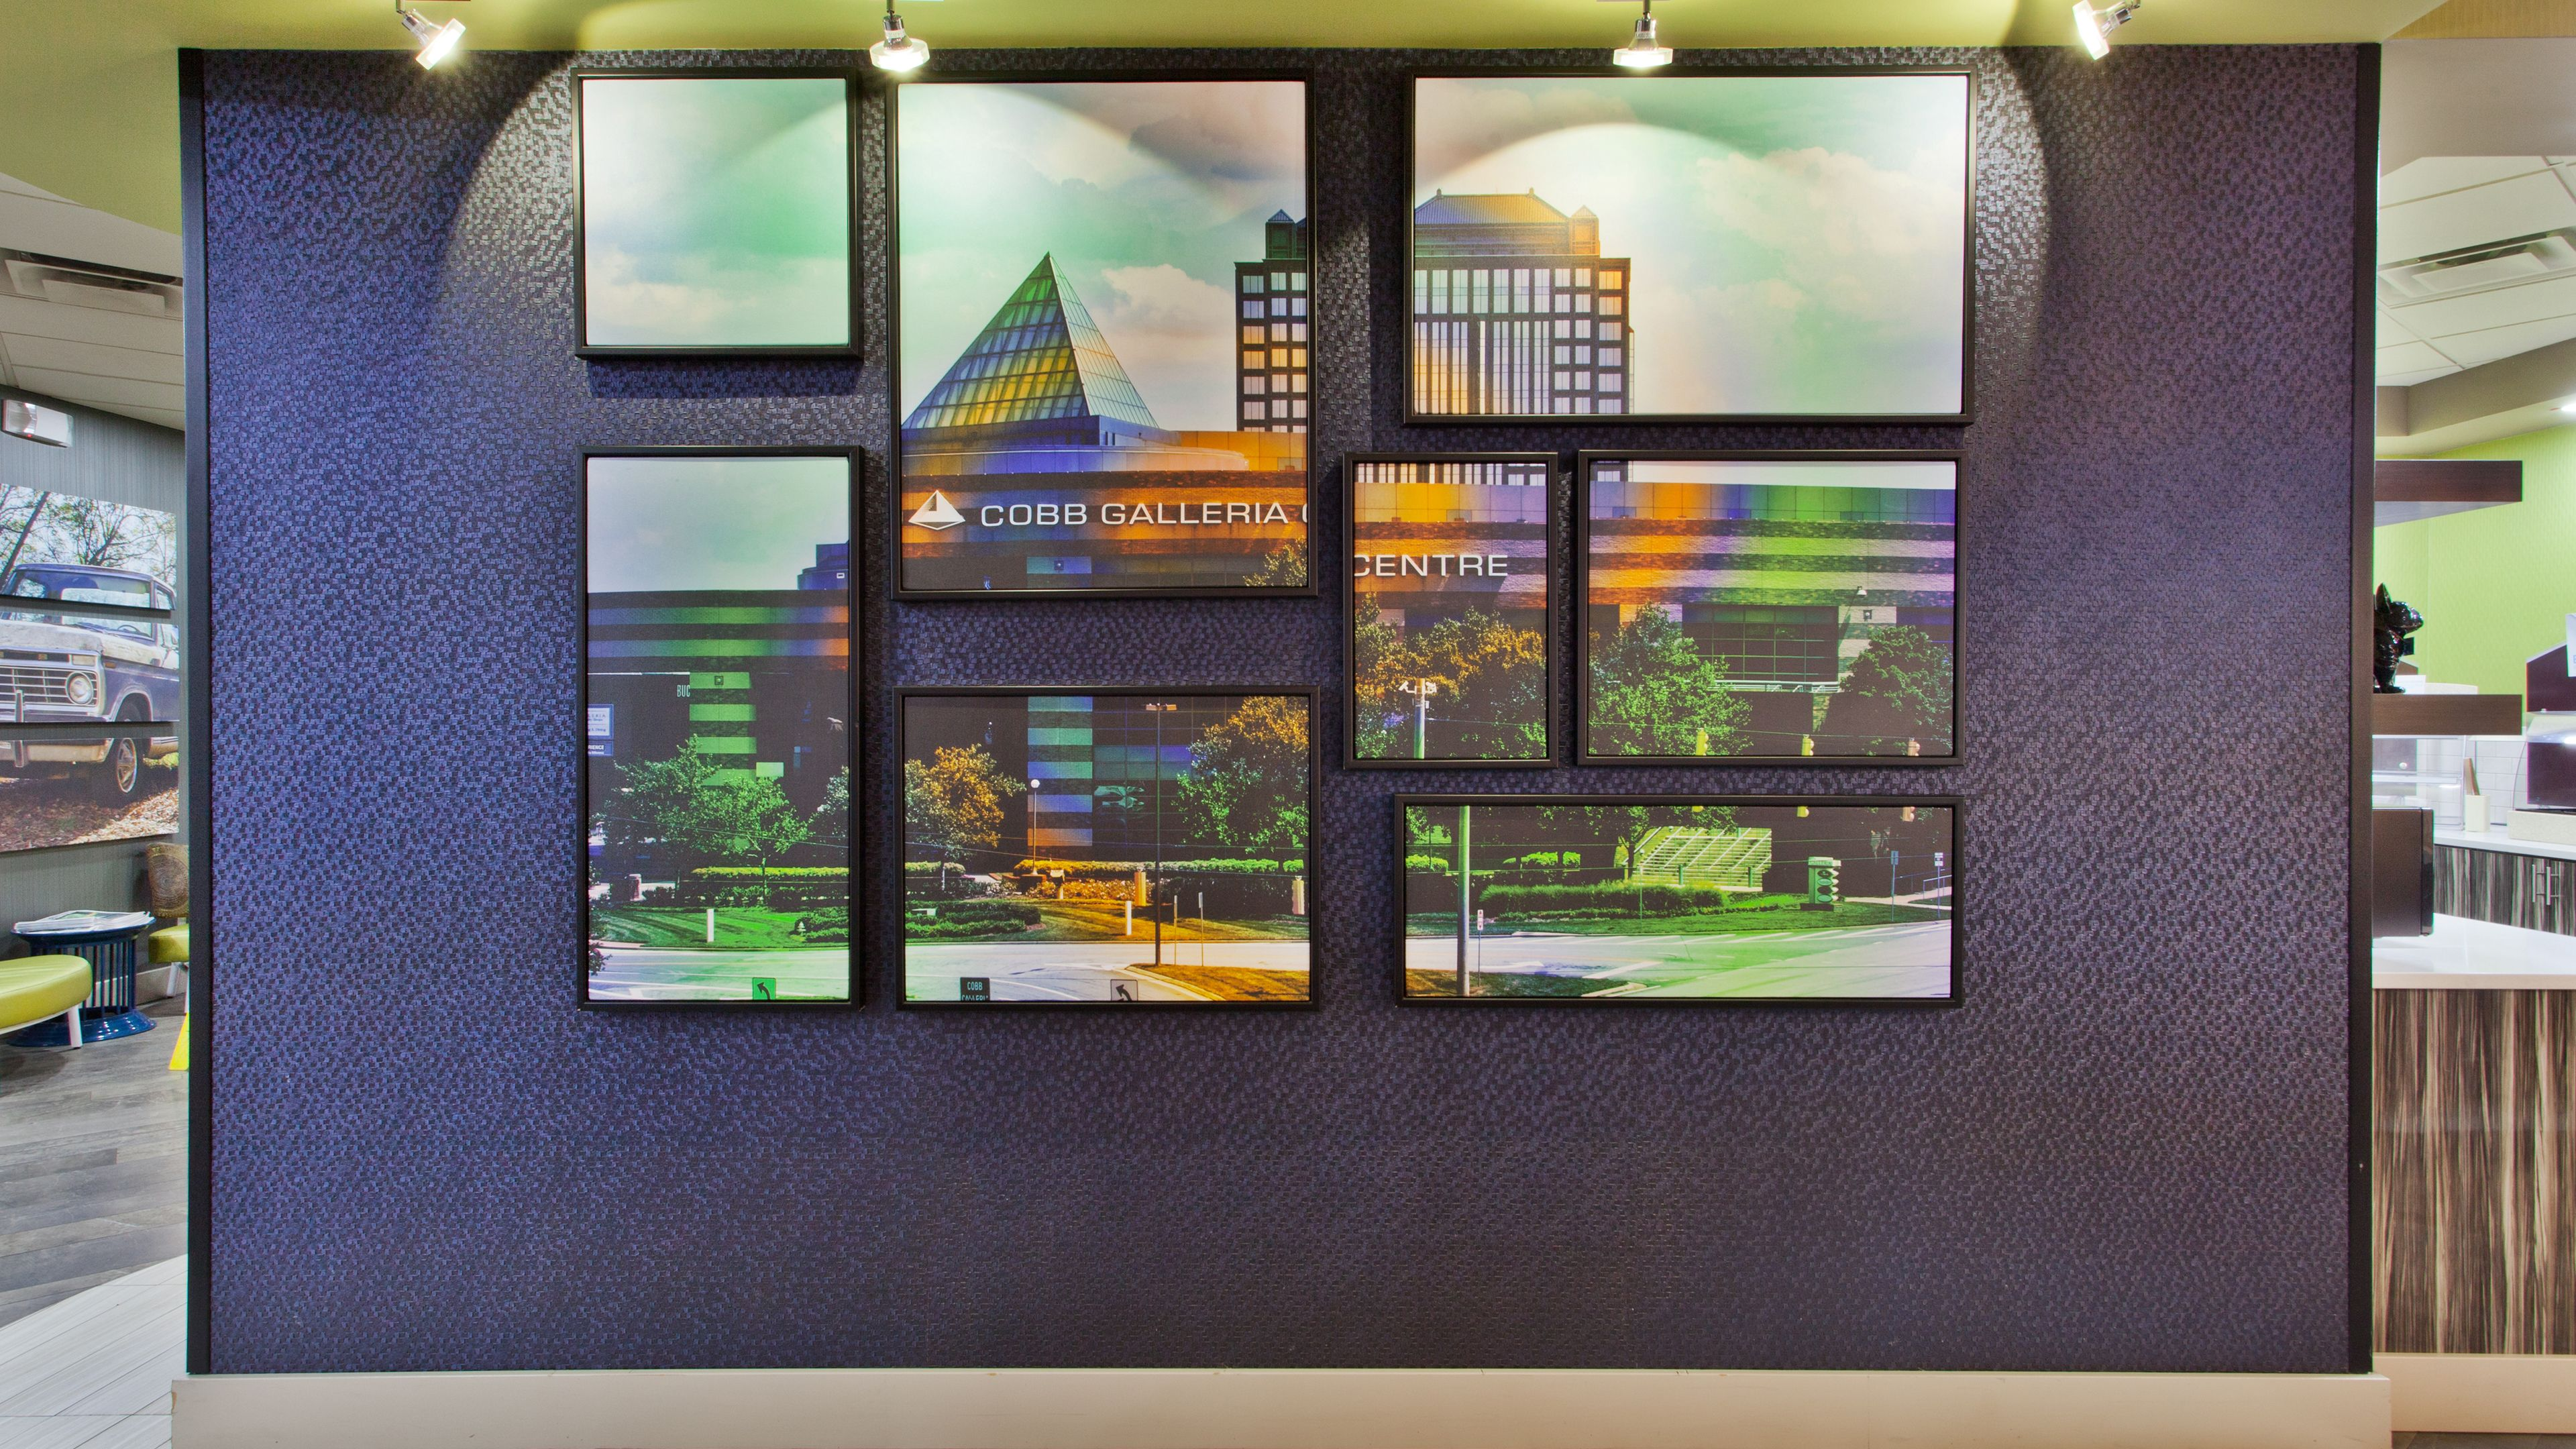 Holiday Inn Express Atlanta Galleria-Ballpark Area image 8